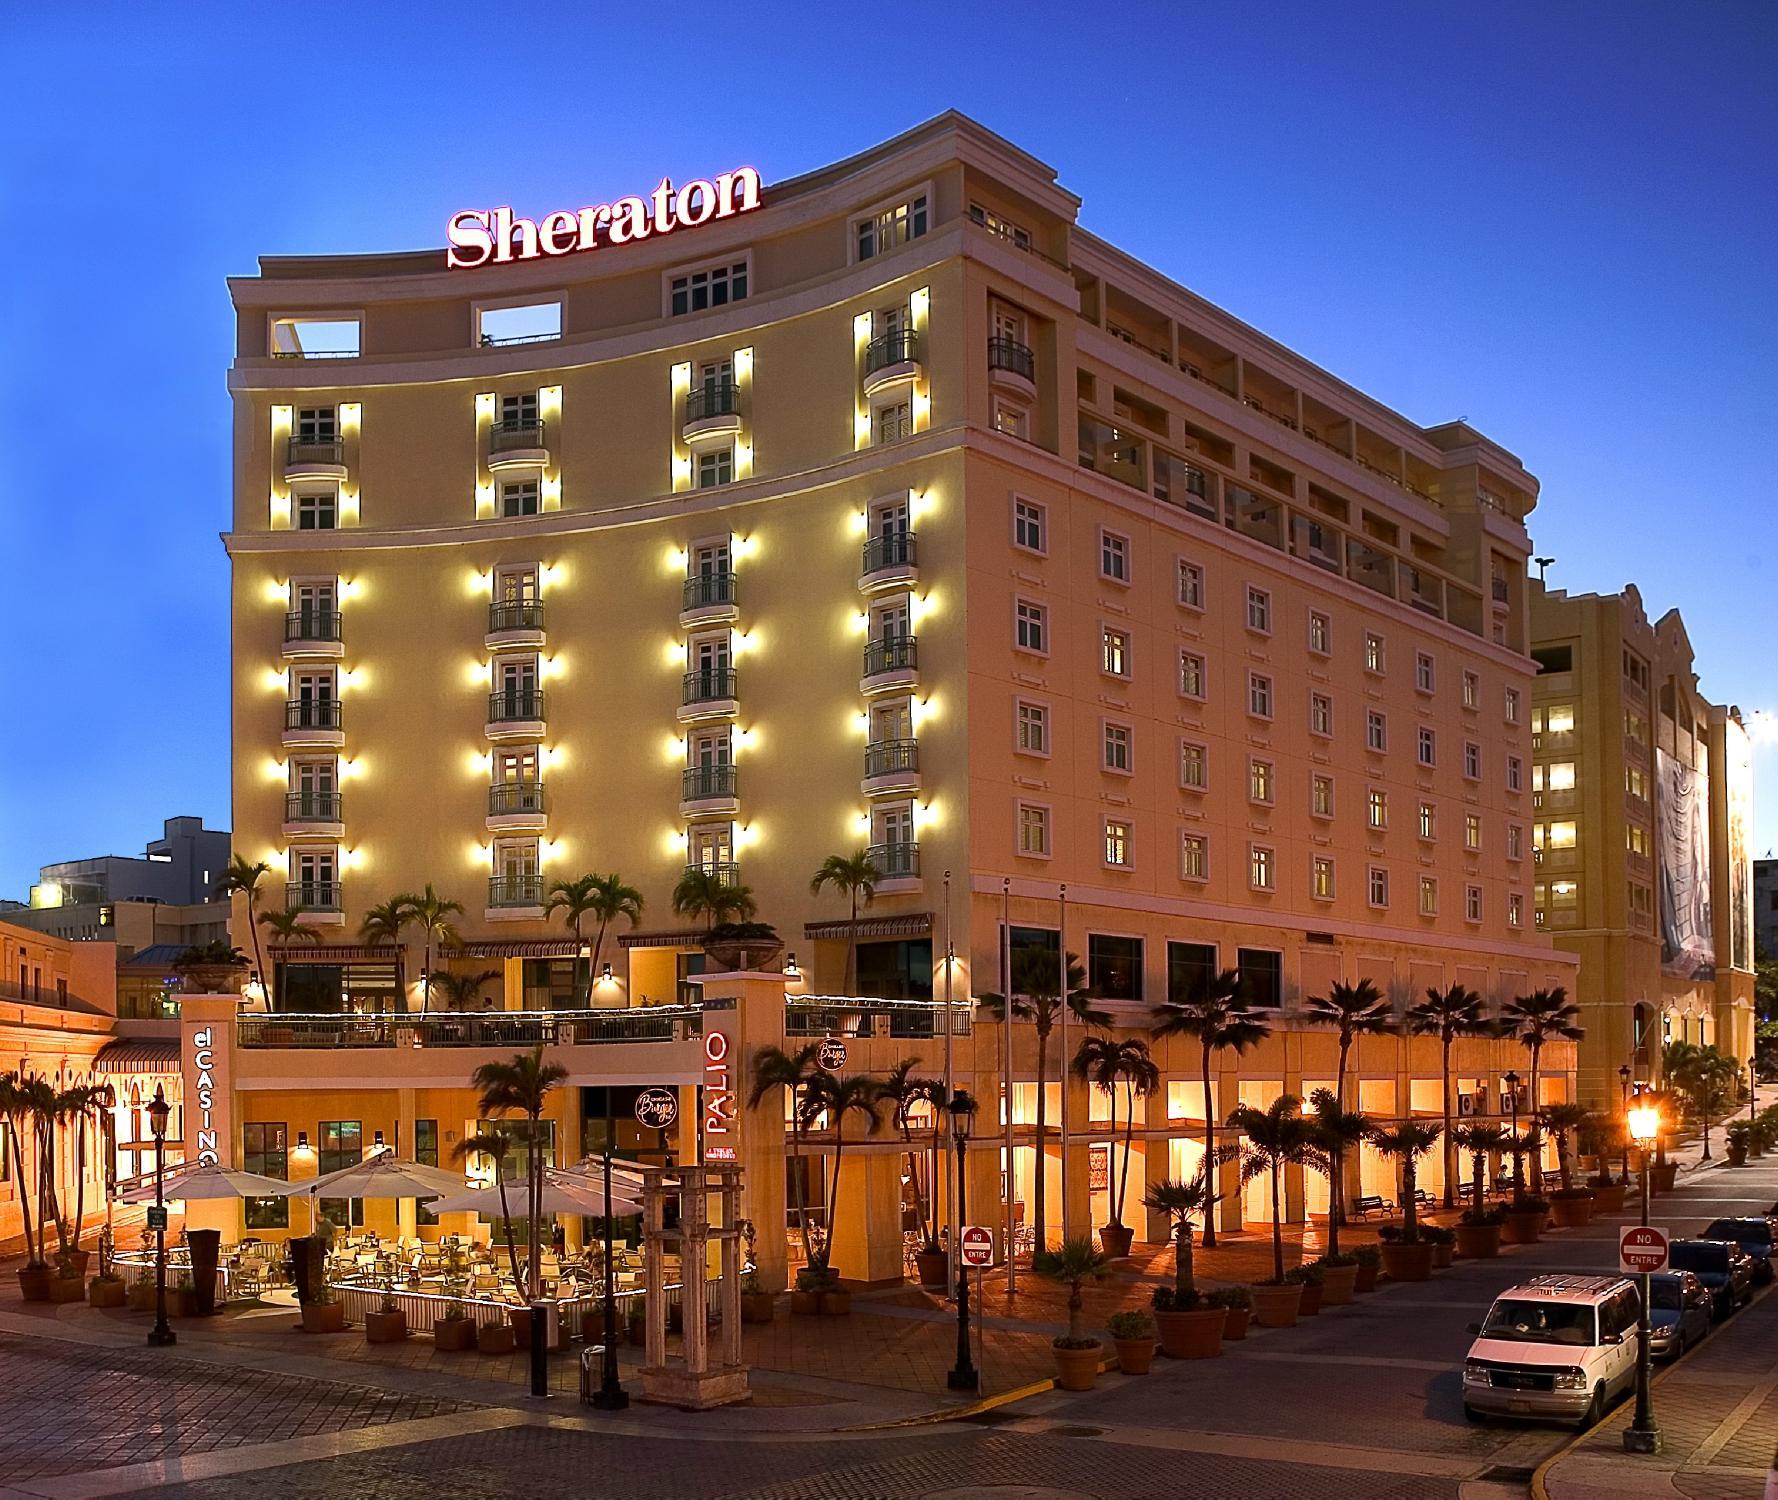 Sheraton Old San Juan Hotel & Casino